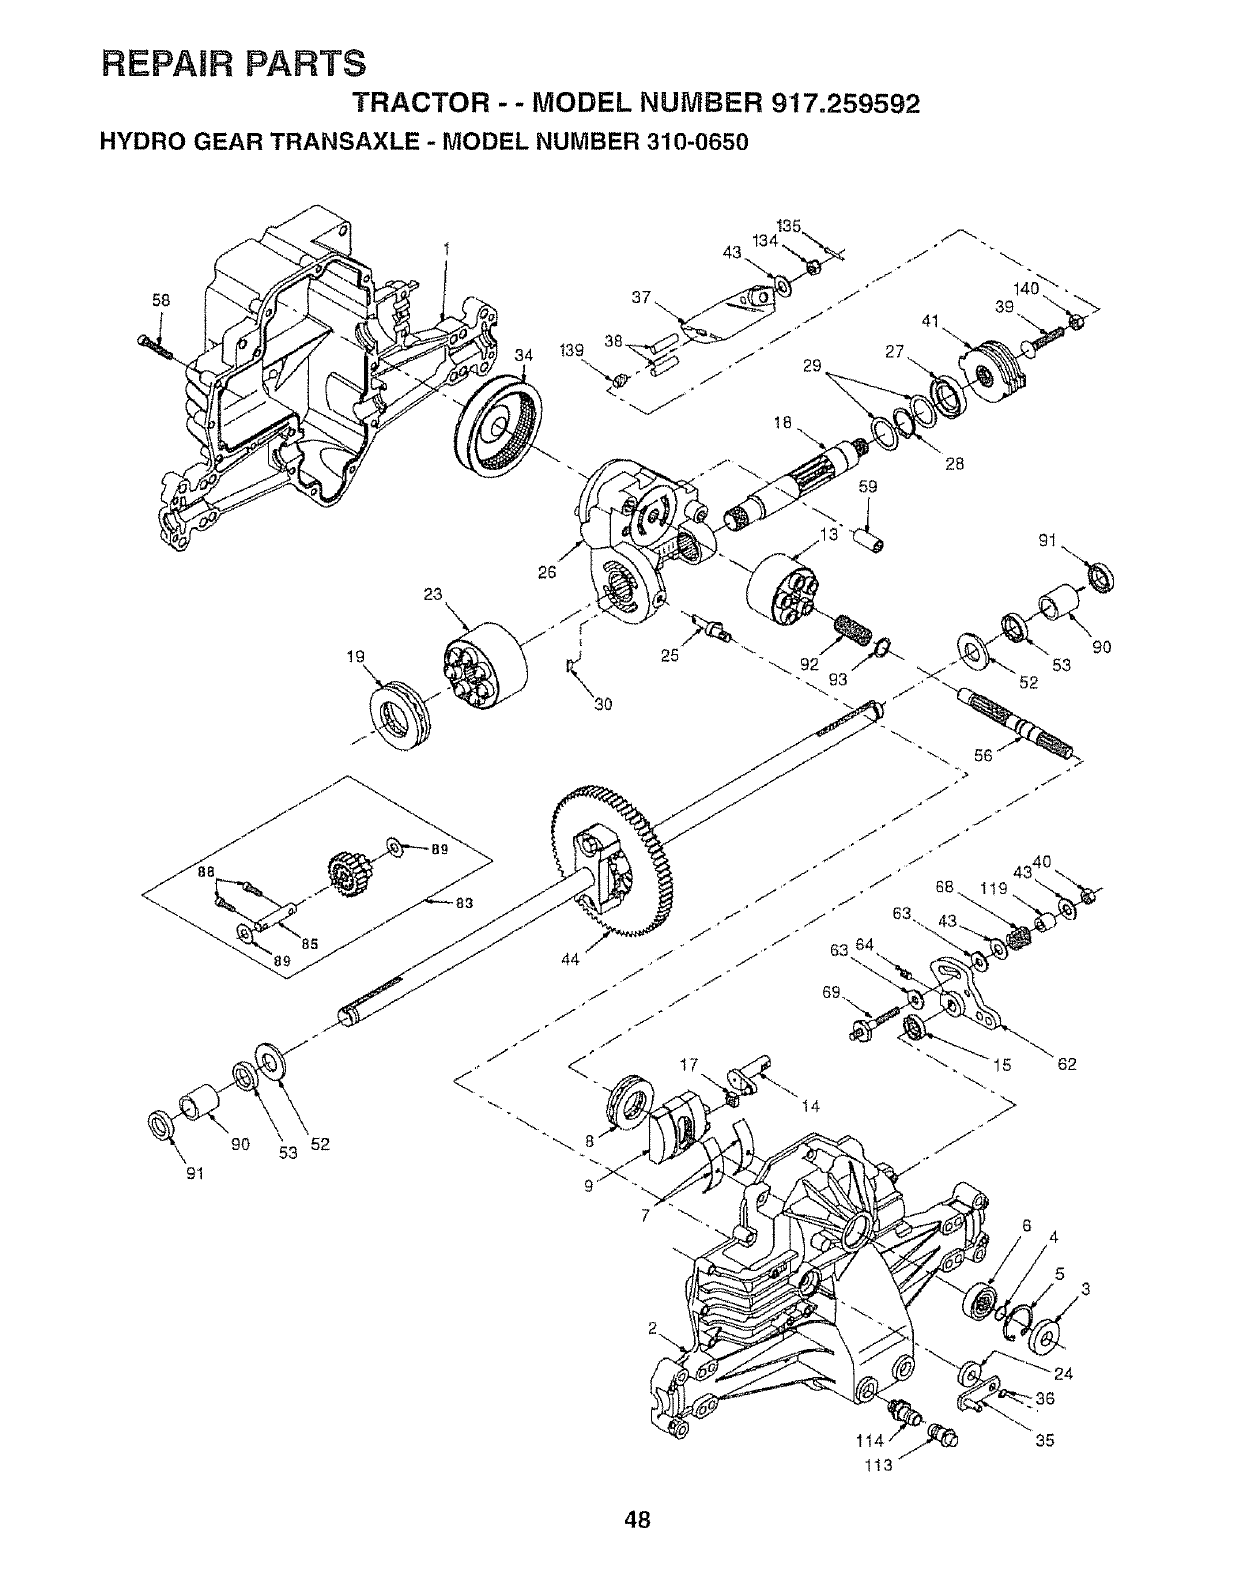 Craftsman 917 259592 HYDRO GEAR TRANSAXLE - MODEL NUMBER 310-0650